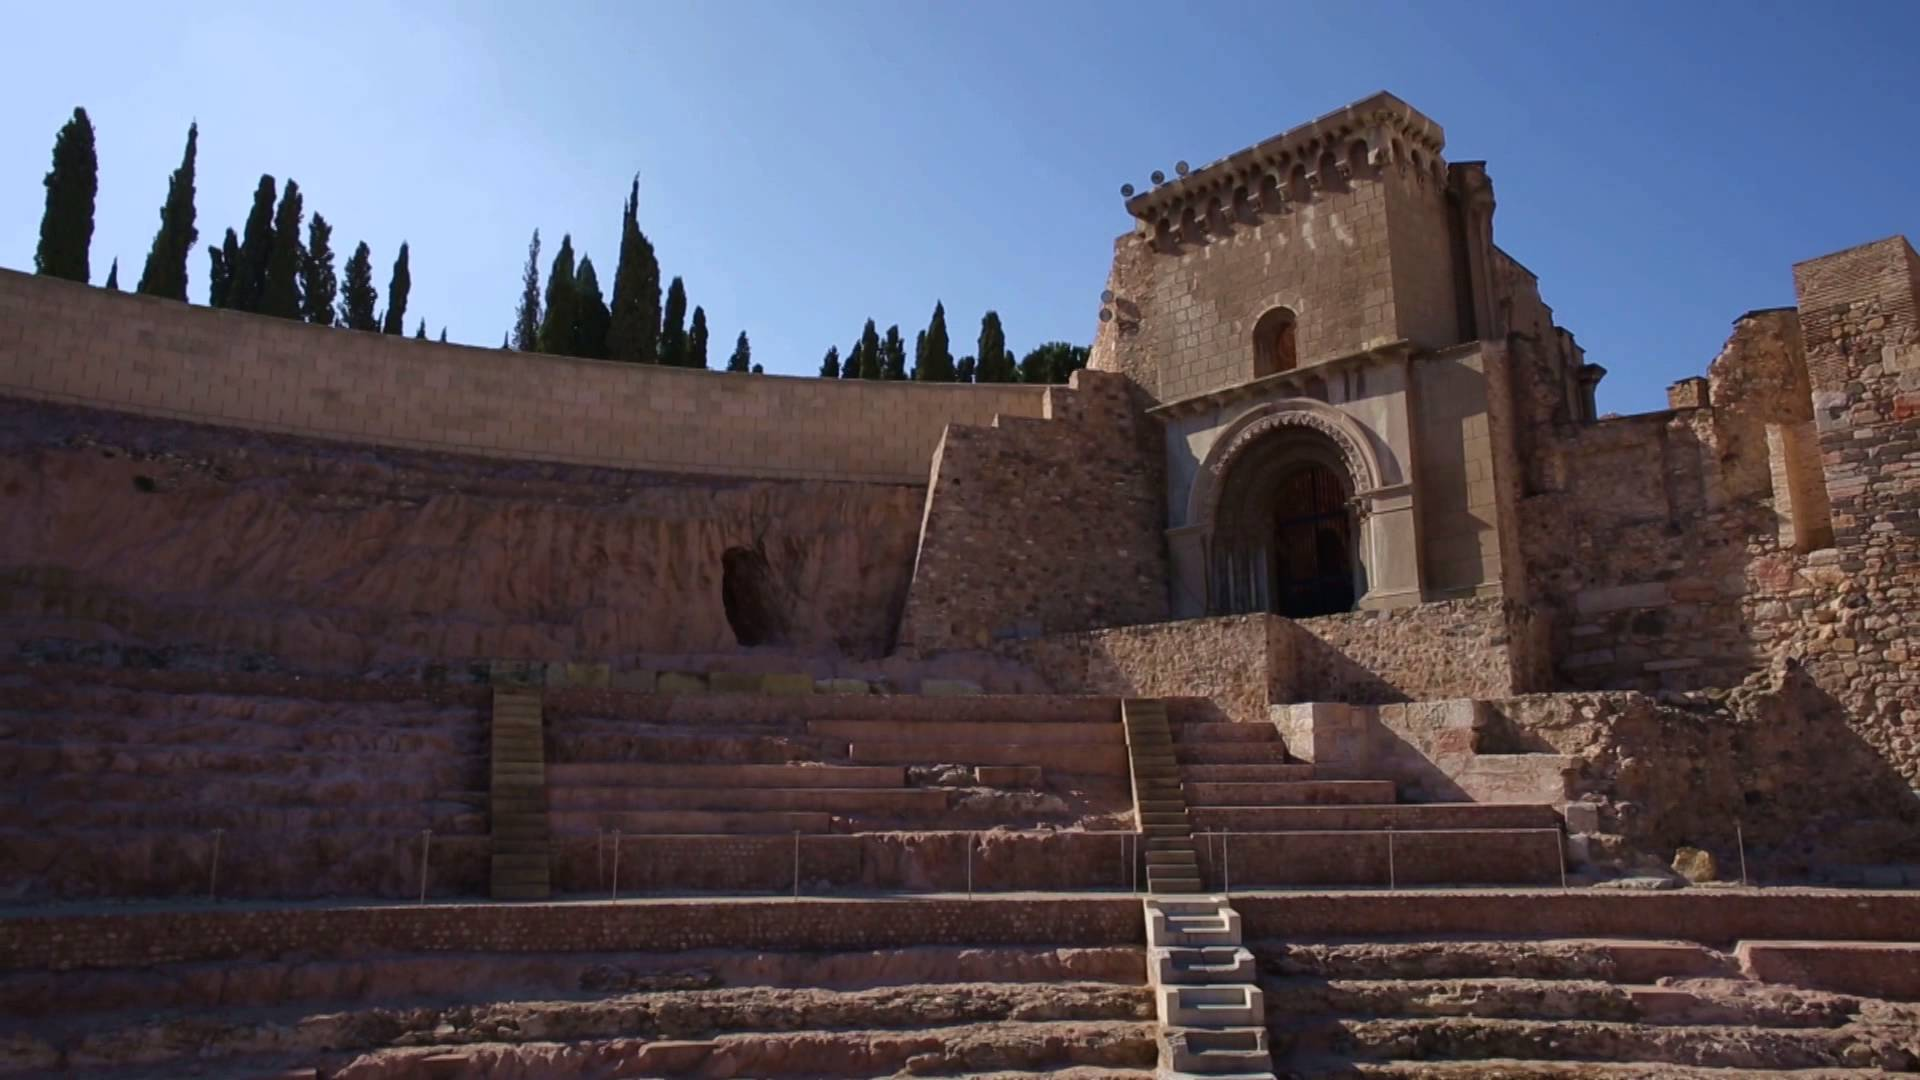 Murcia - Página 6 Maxres21